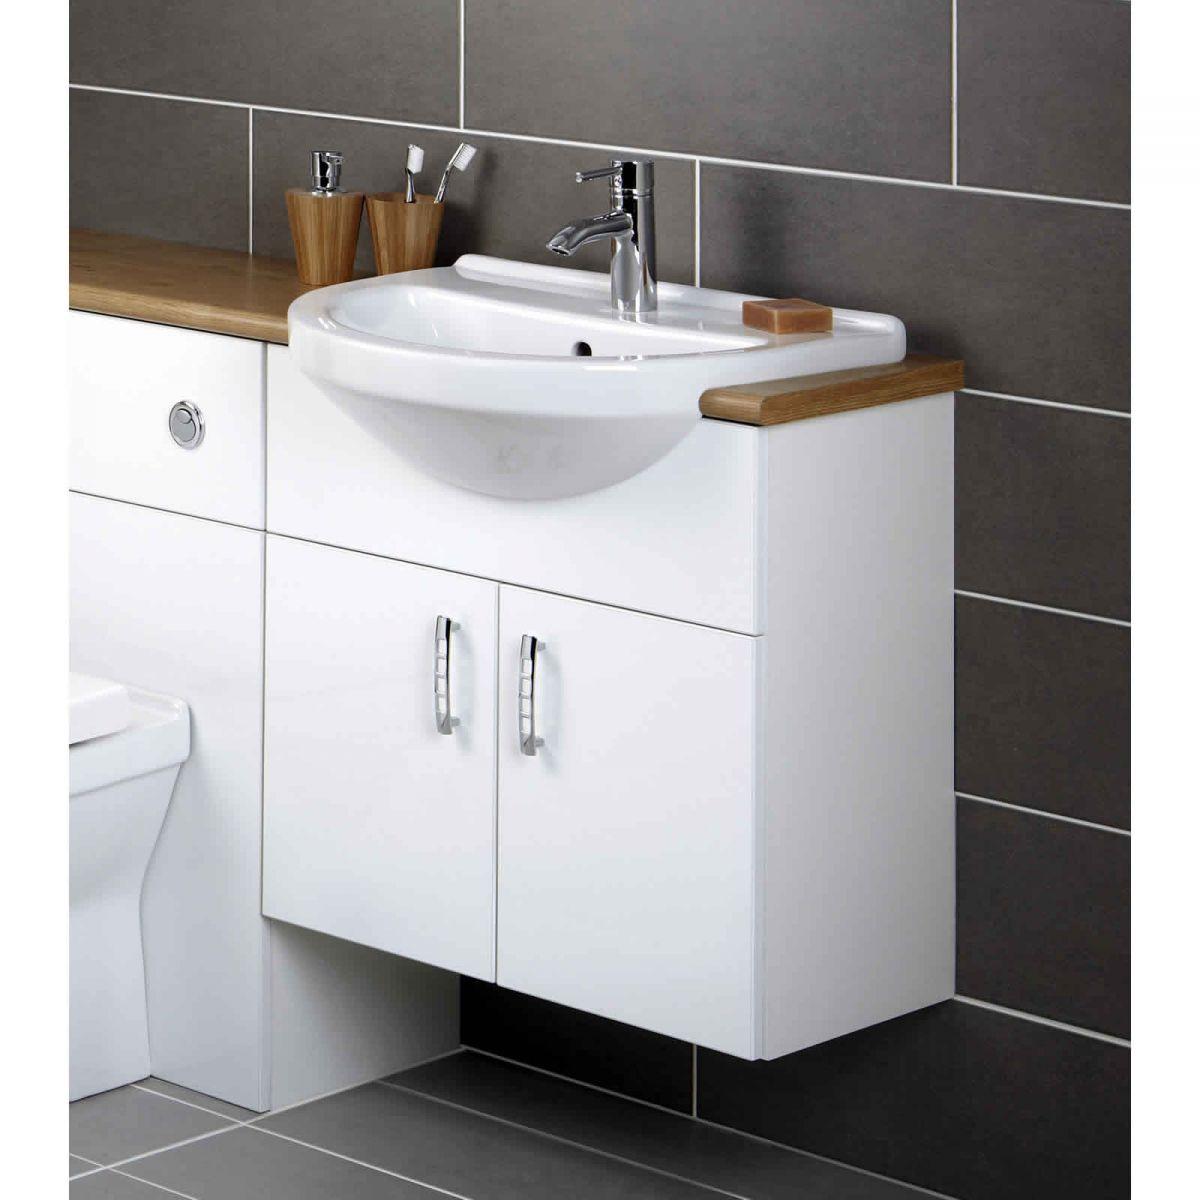 Wonderful Home Furniture Amp DIY Gt Bath Gt Bathroom Suites Gt Other Bathroom